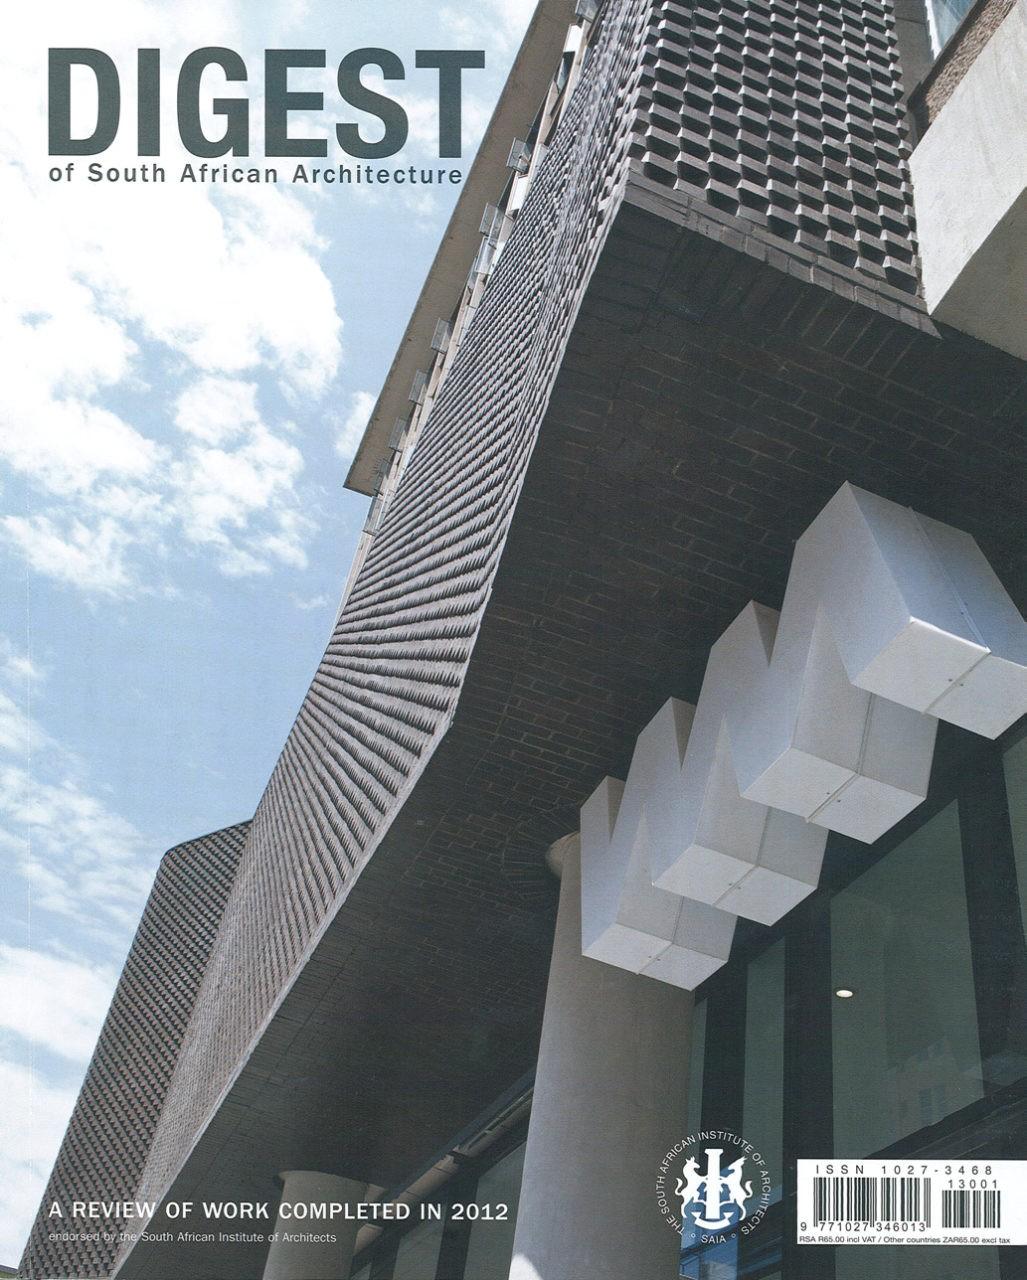 http://www.saota.com/wp-content/uploads/2018/01/2012_Jan_Digest_SA_Architecture_SAOTA_Page_1.jpg